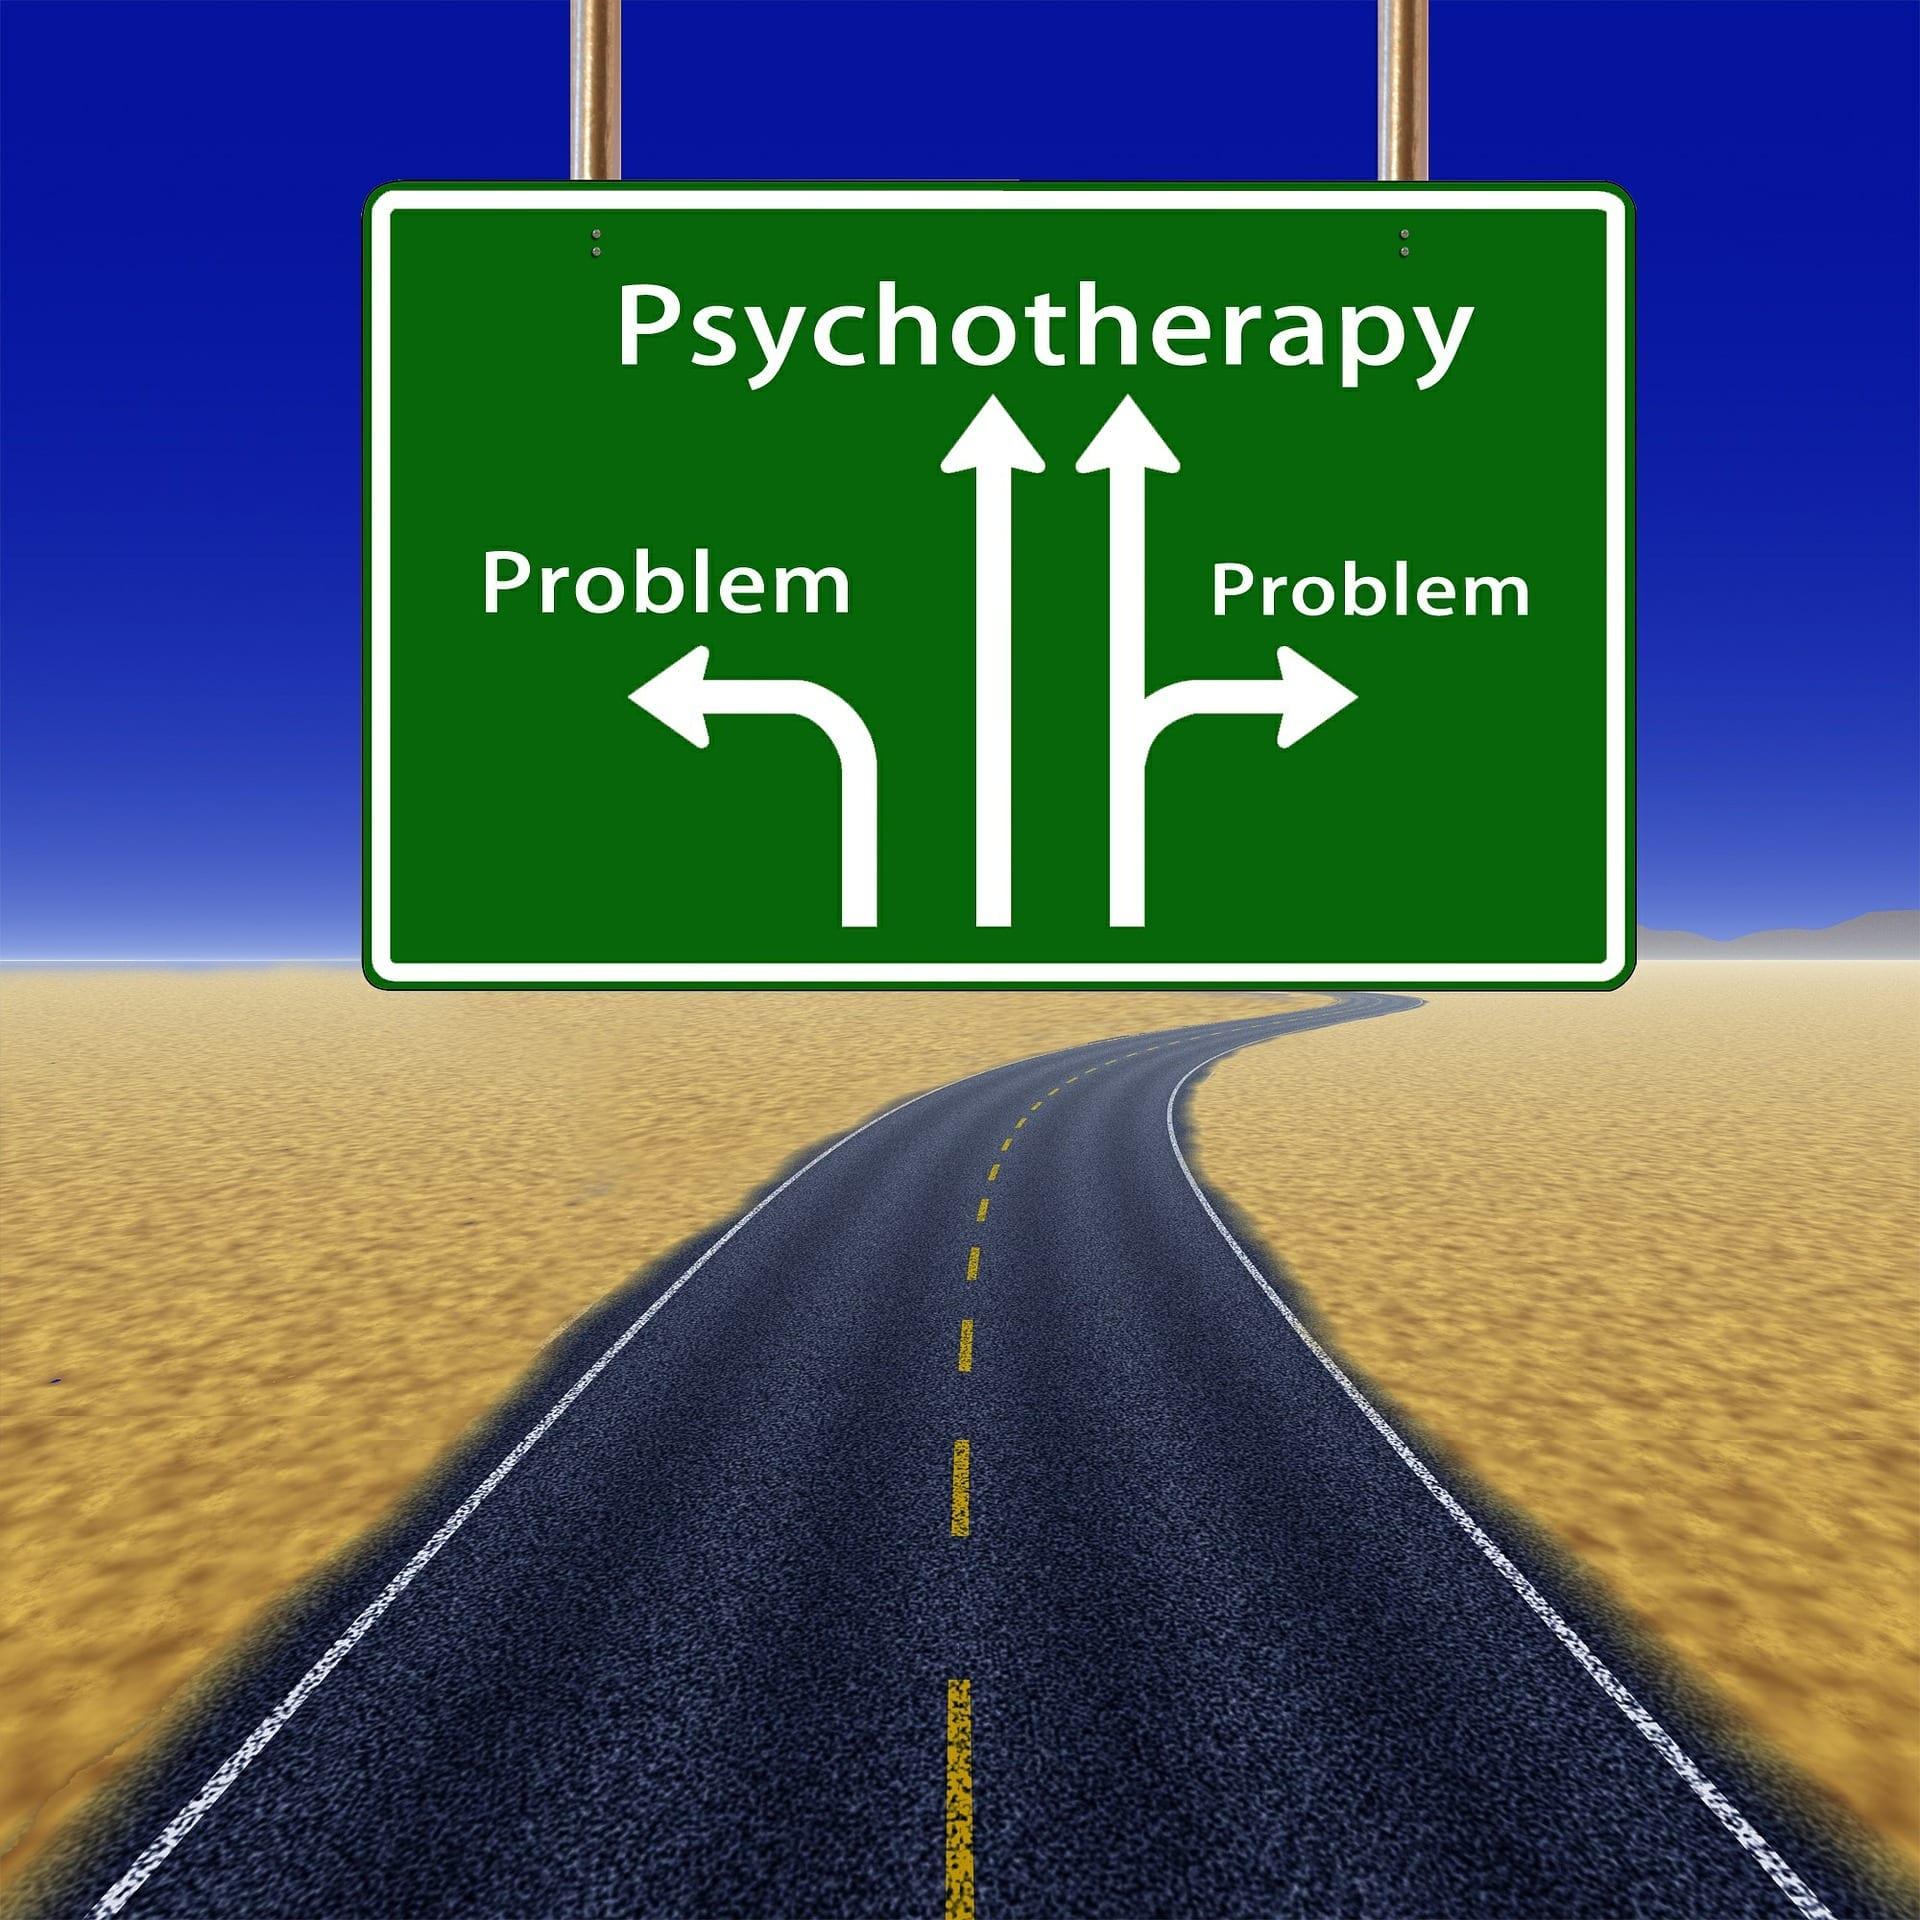 Psychotherapy Roadmap